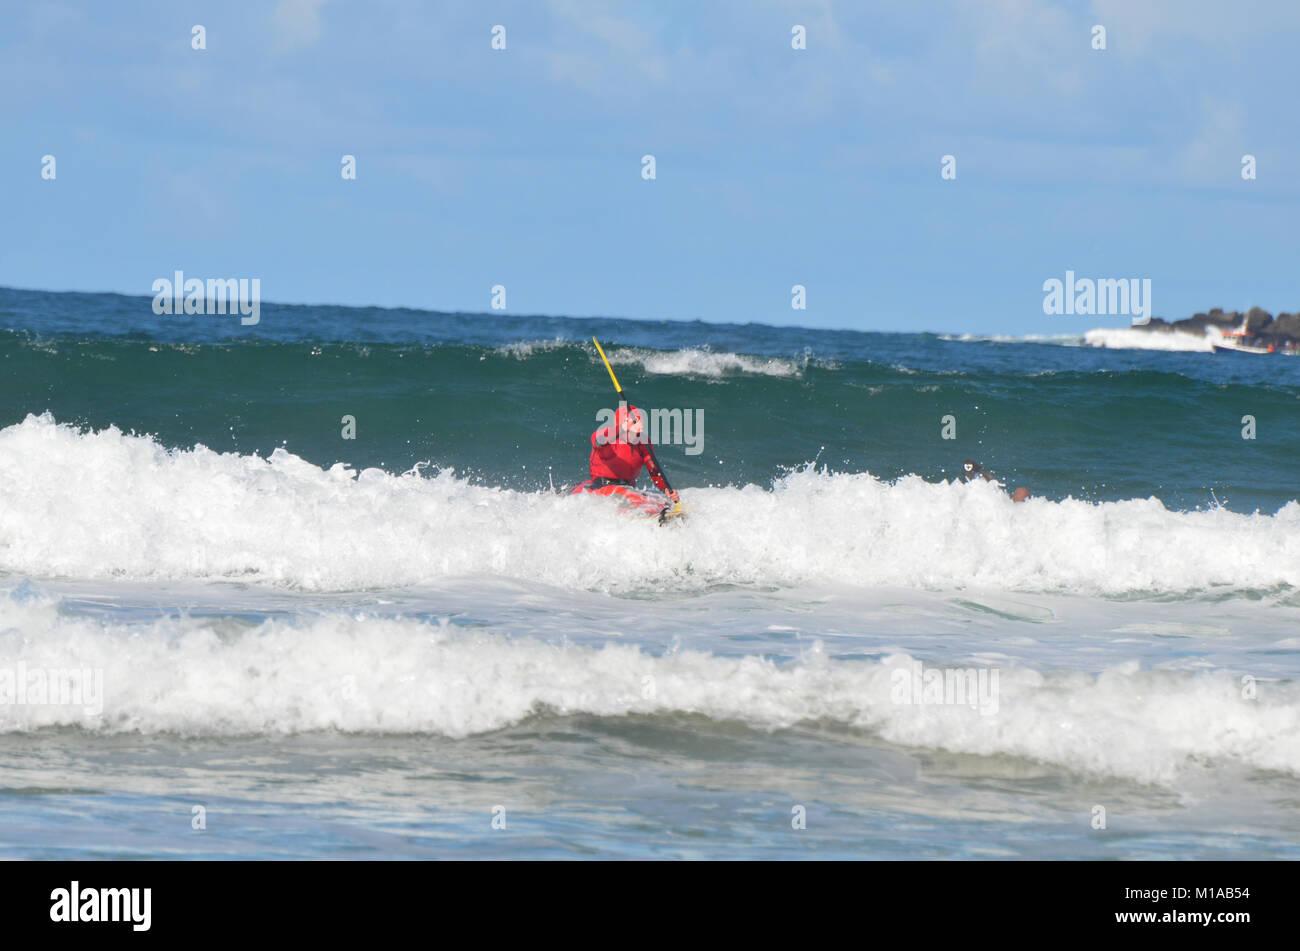 Portrush, Co.Antrim, Northern Ireland. September 14th 2013 :-A Kyaker rides the atlantic surf - Stock Image